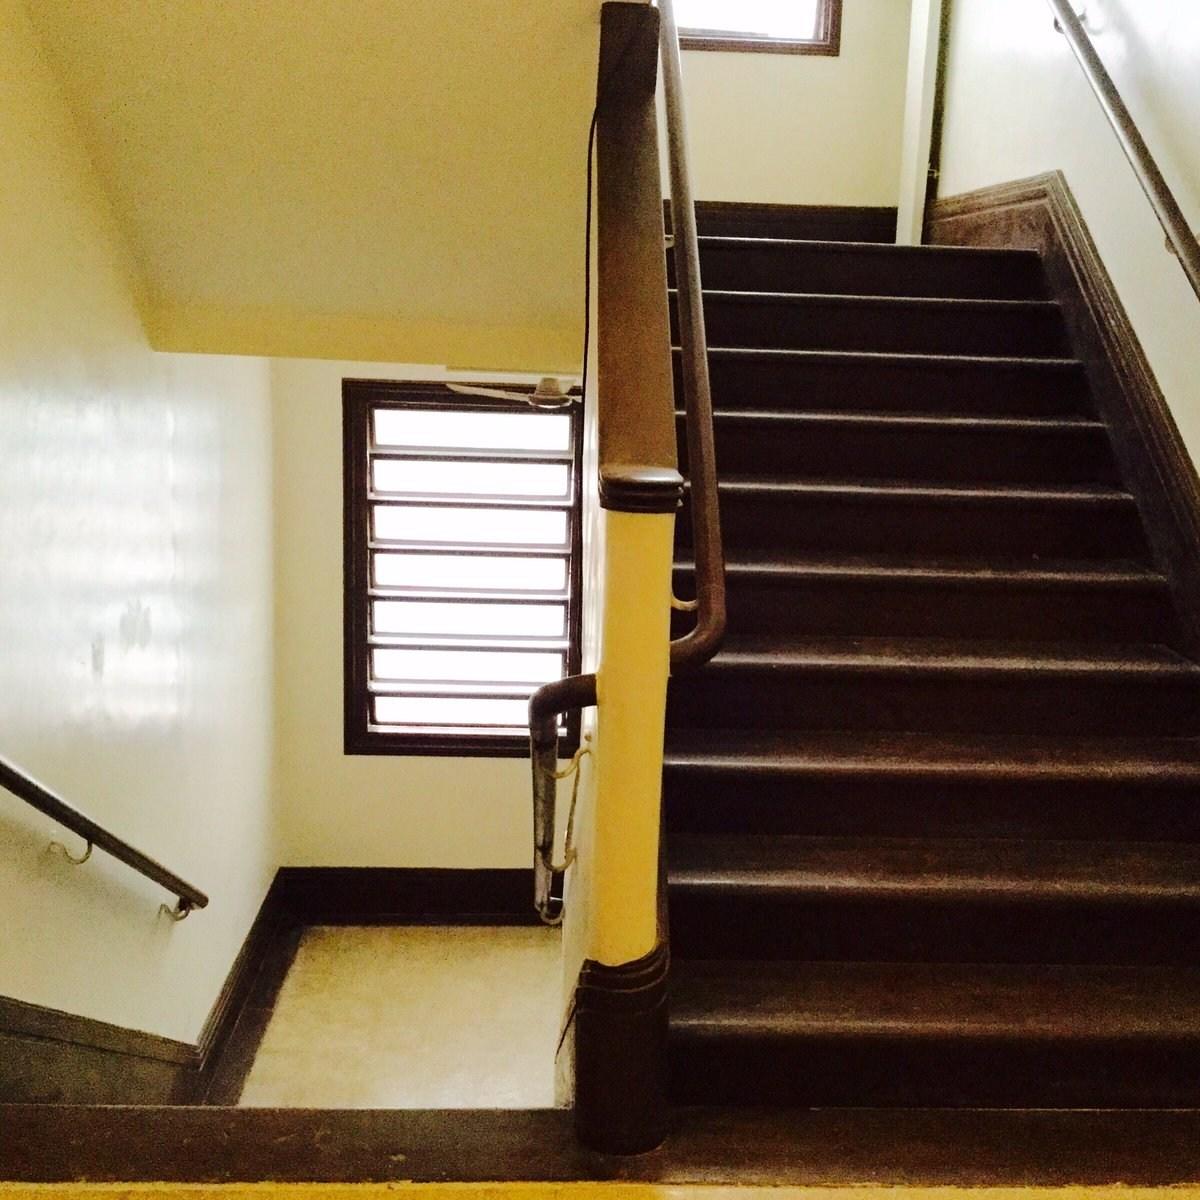 Art Deco Mumbai On Twitter Burma Teak Staircase Bannister | Teak Wood Staircase Railings | Wood Frame | Hand | Sitout | Wood Carving | Lakdi